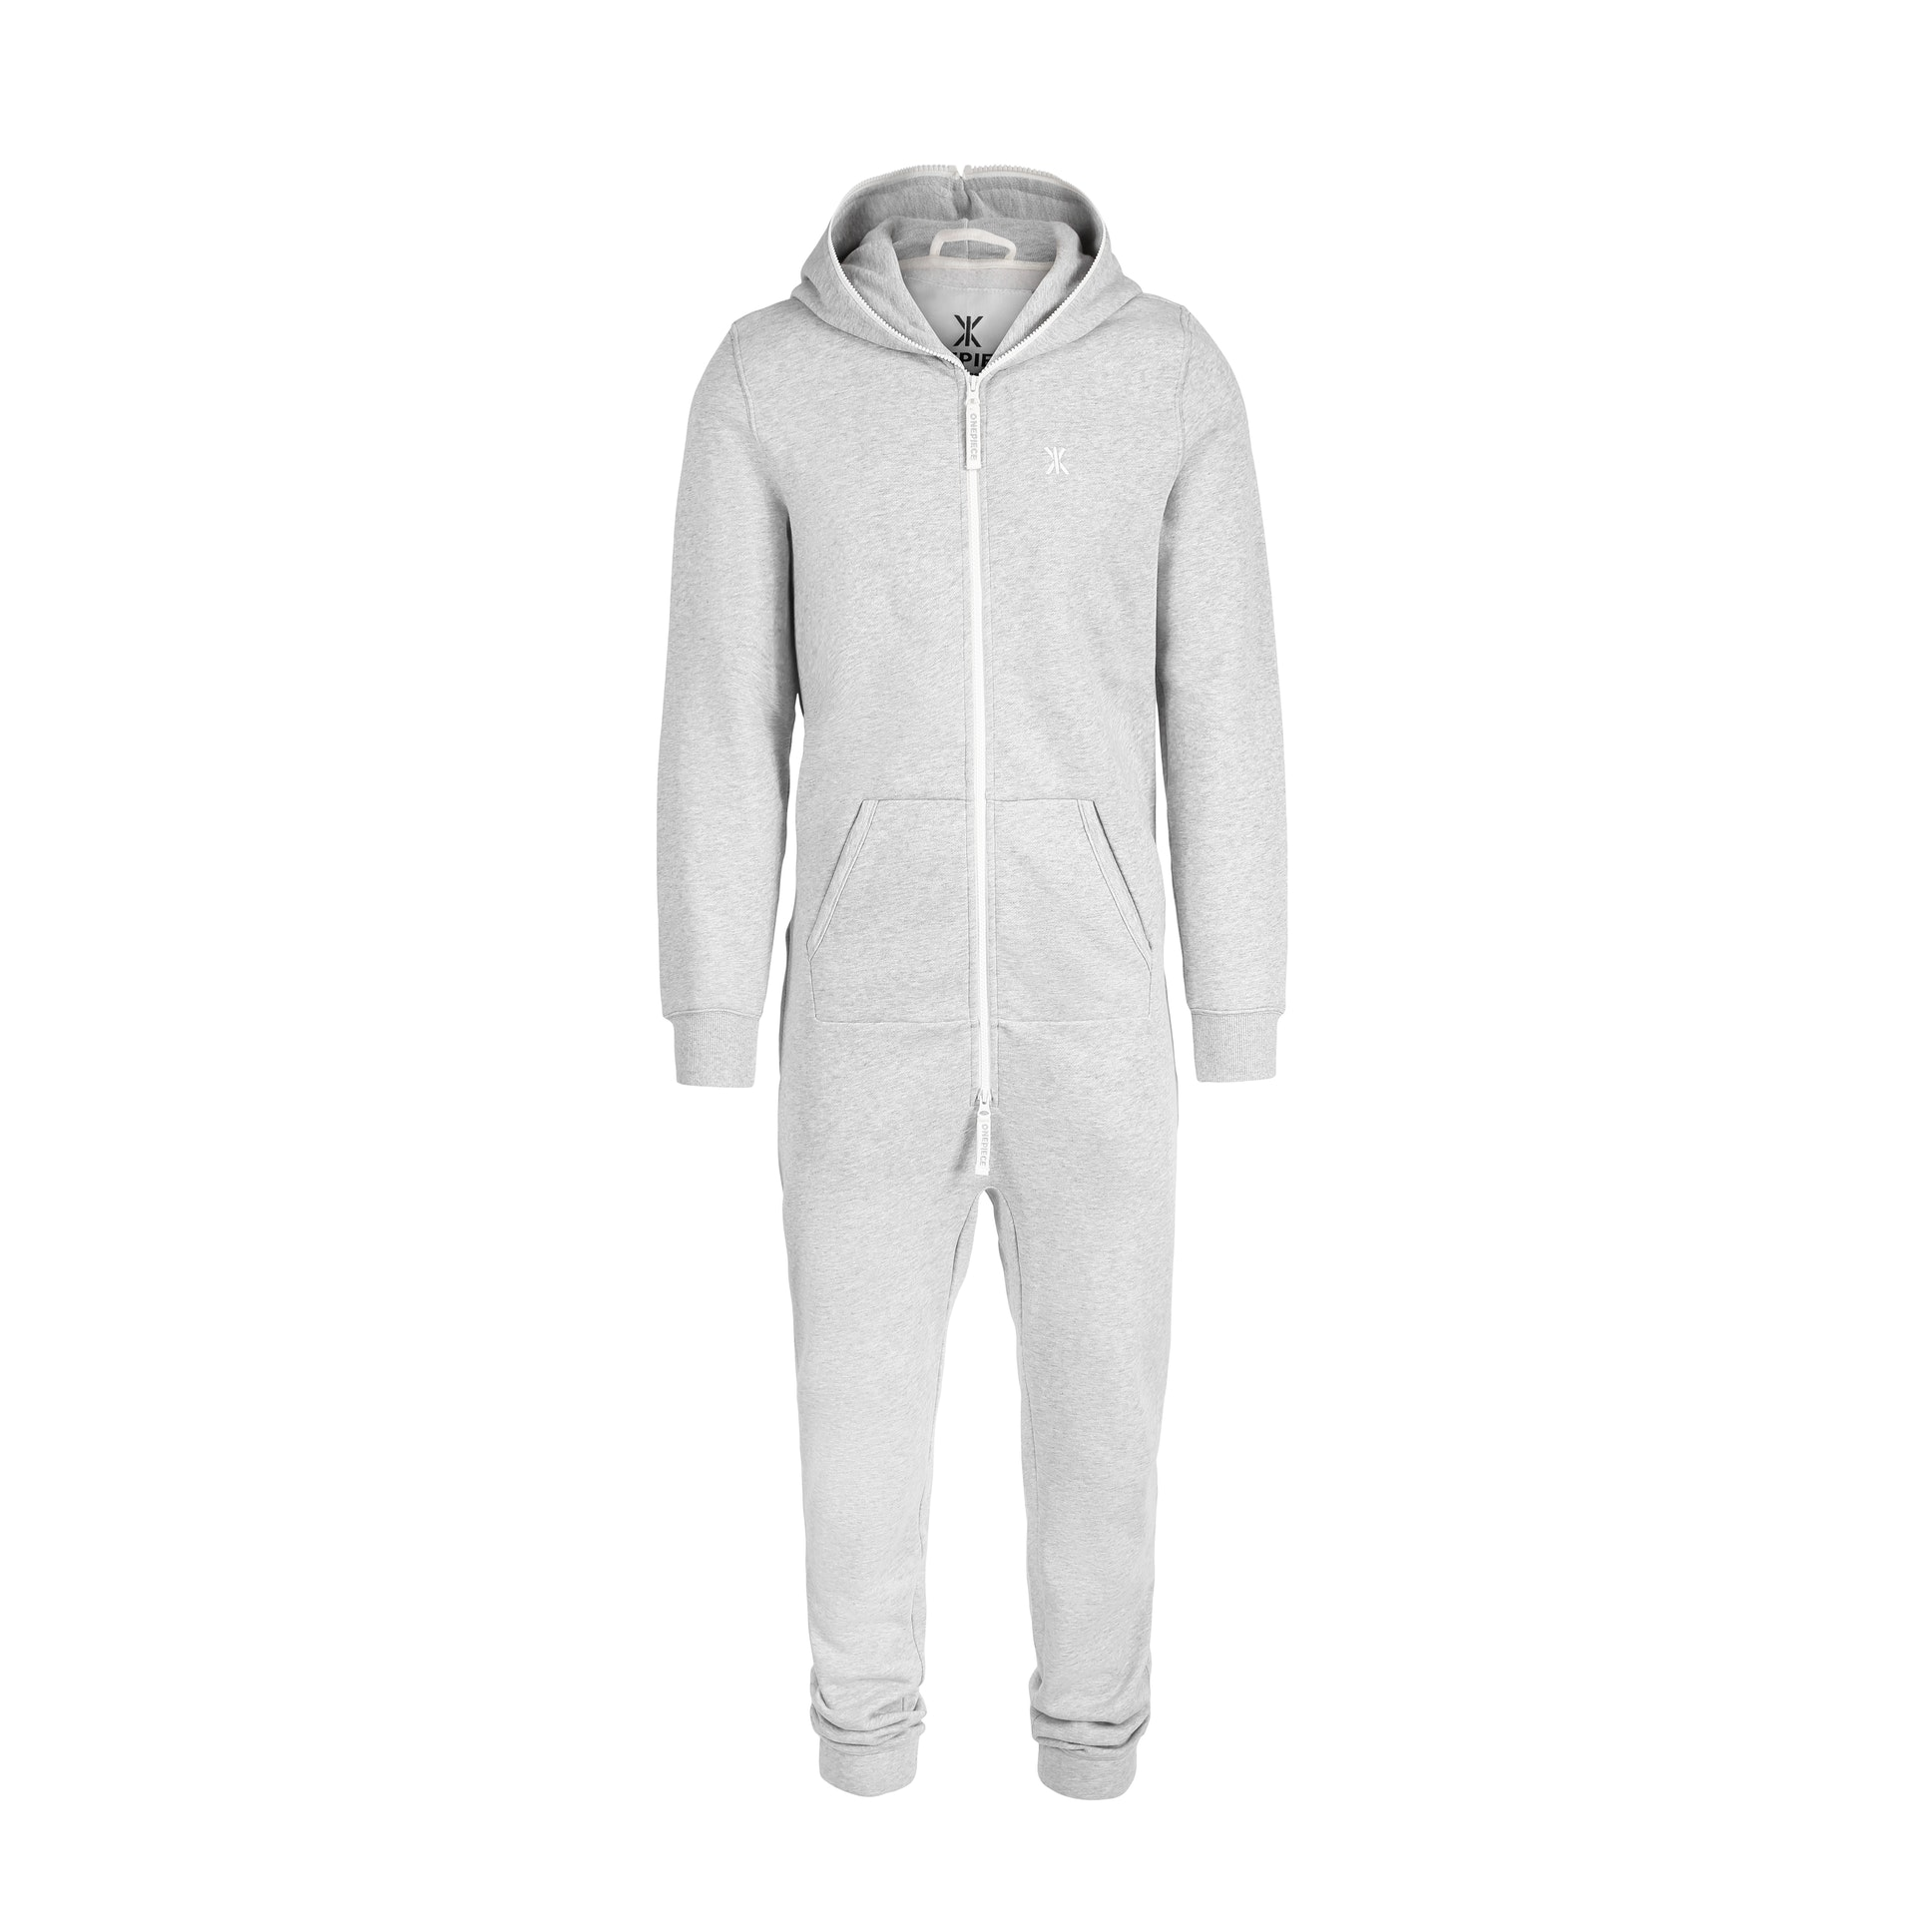 original onesie 2.0 grey melange